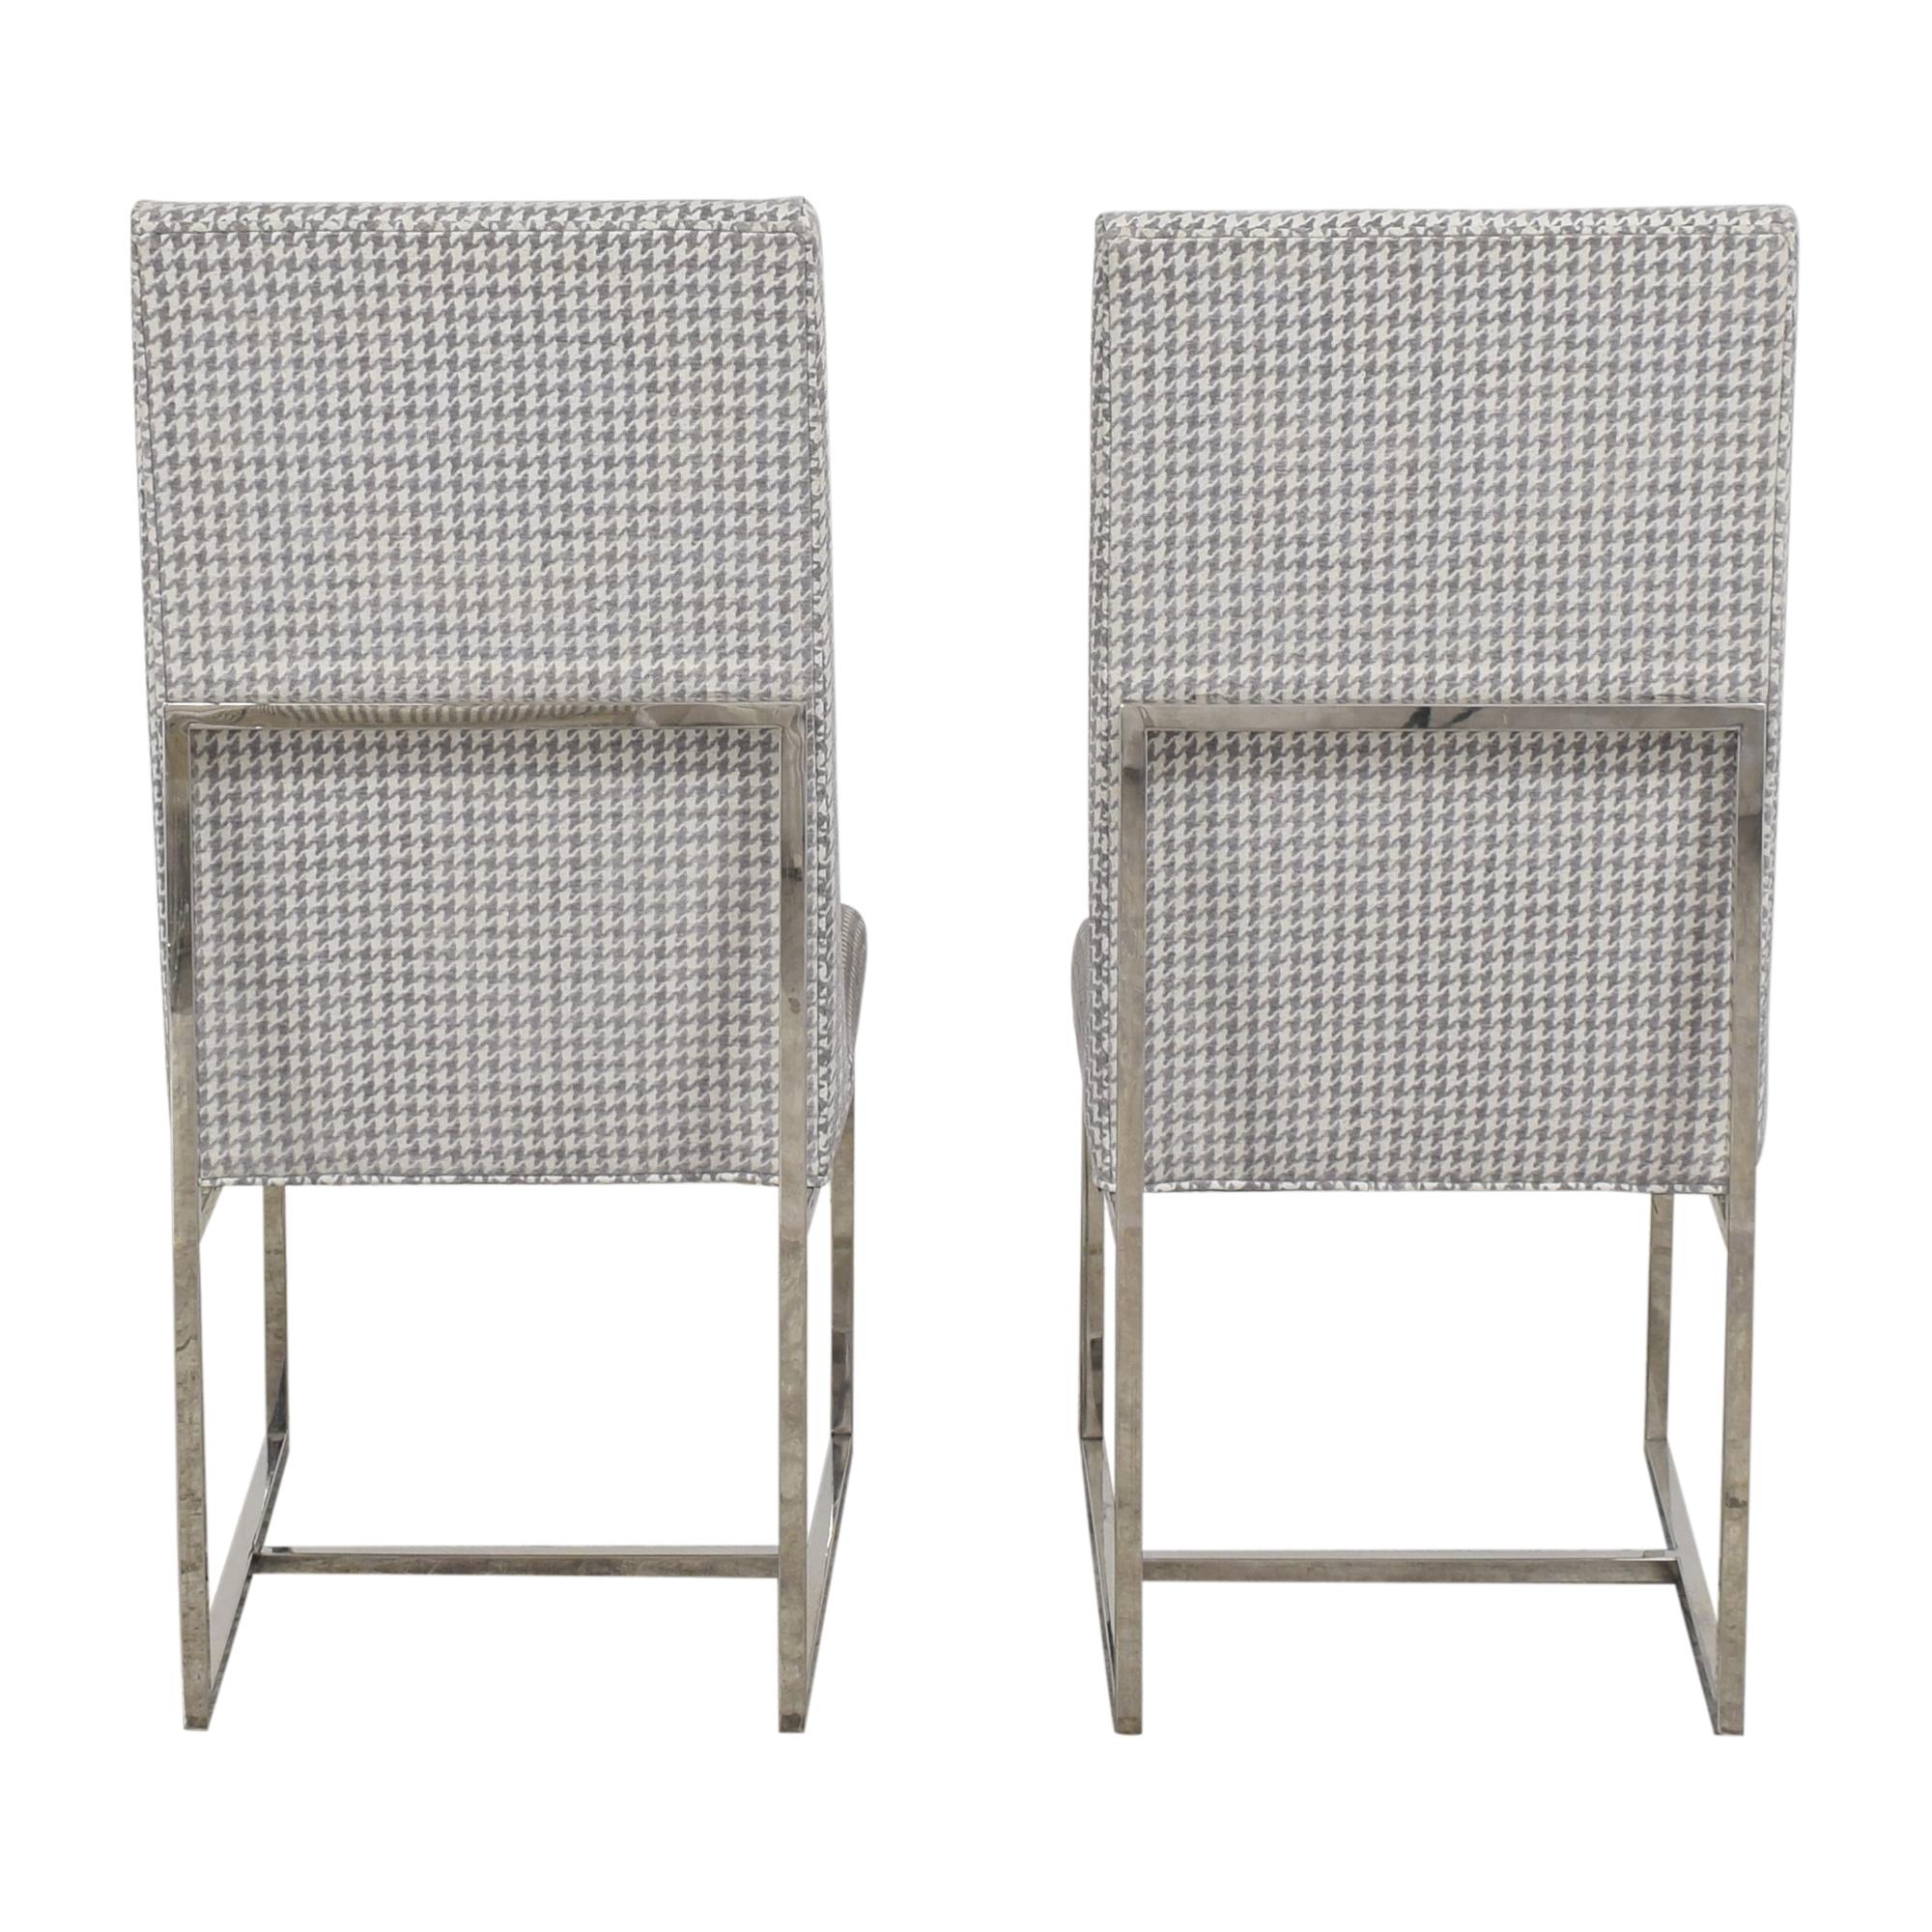 Mitchell Gold + Bob Williams Mitchell Gold + Bob Williams Gage Tall Dining Chairs on sale